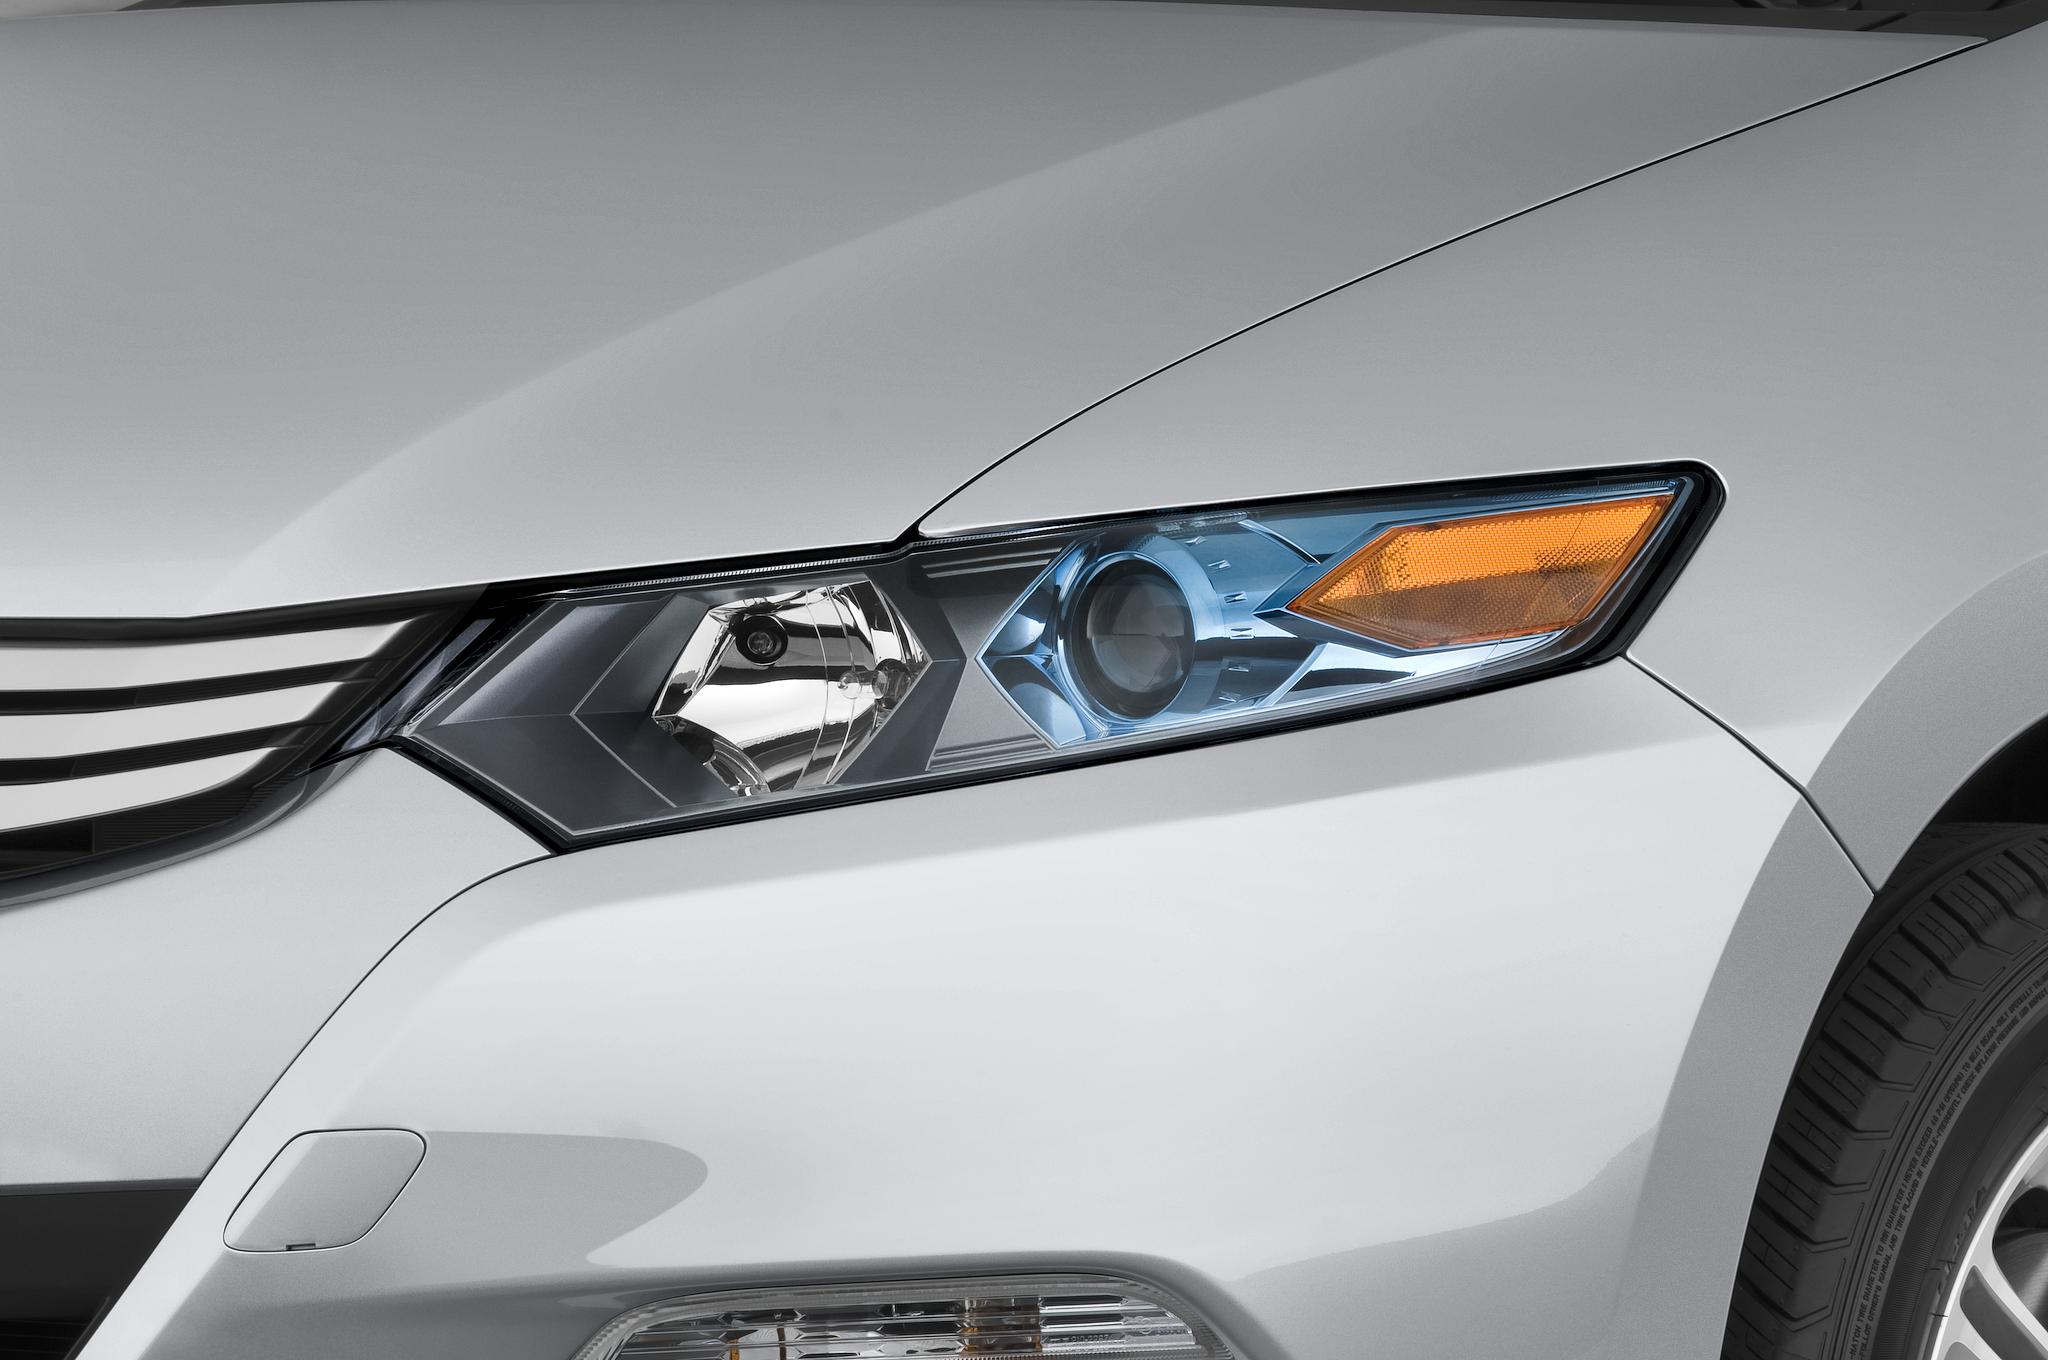 2010 Honda Insight - Fuel Efficient Cars, Hybrids and